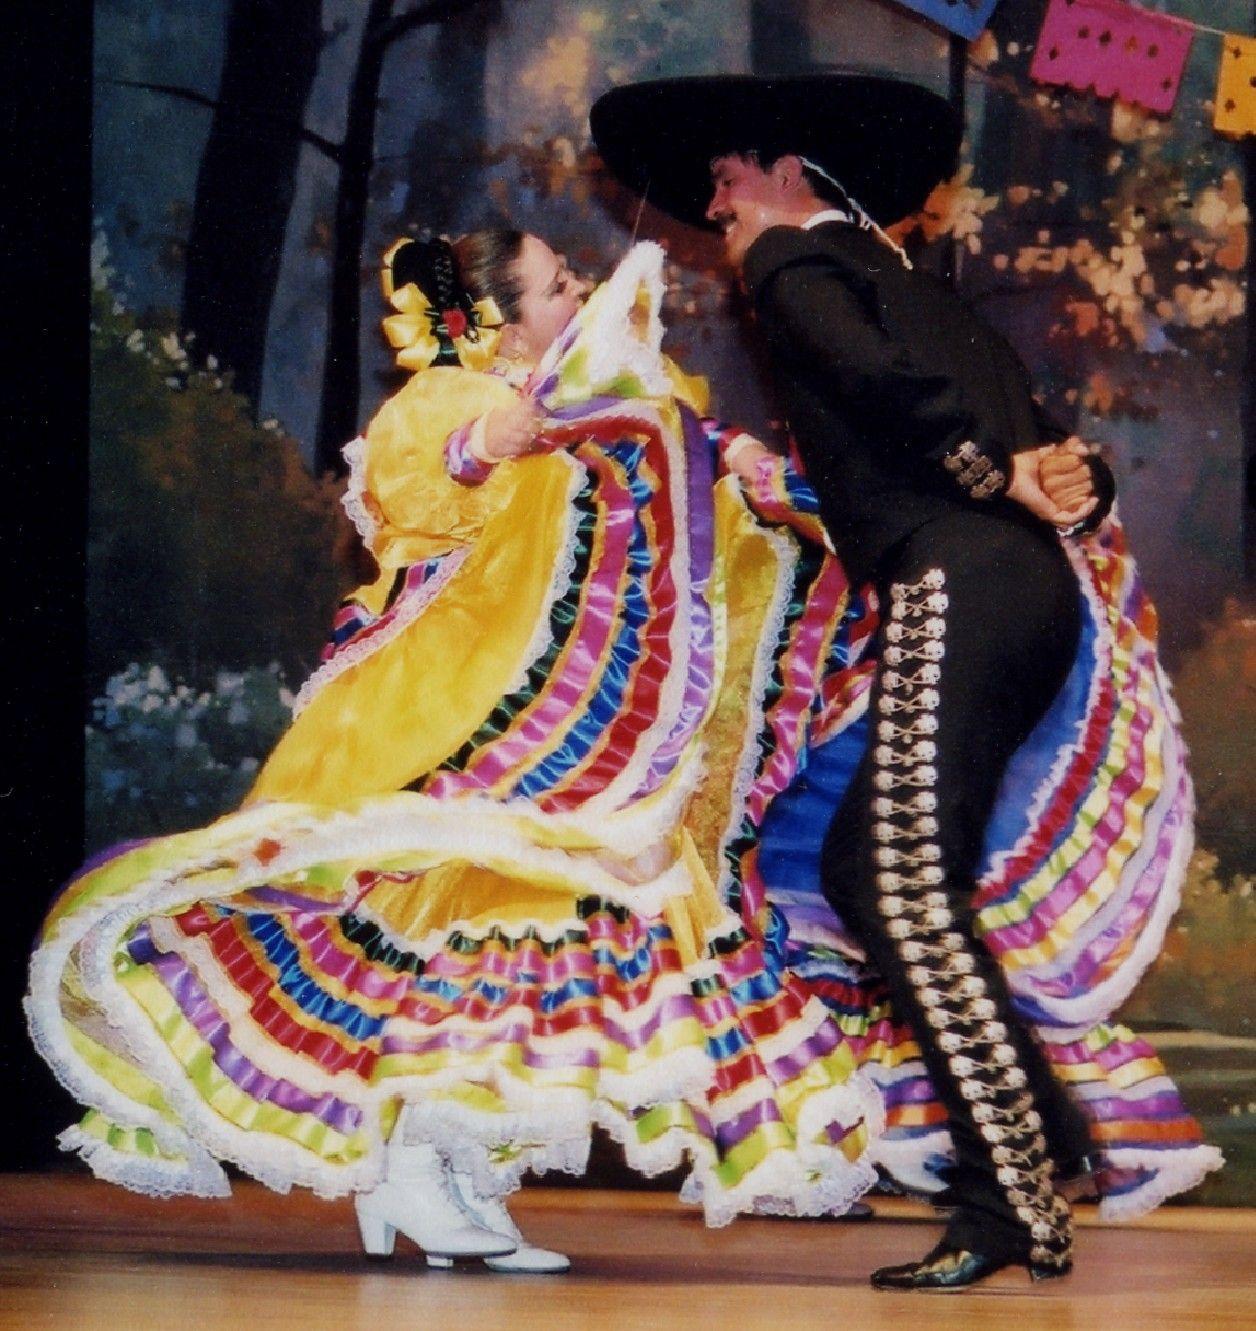 Jalisco Mexico Mexican Folklorico Dancing Ballet Folklorico Mexico Culture Mexican Culture